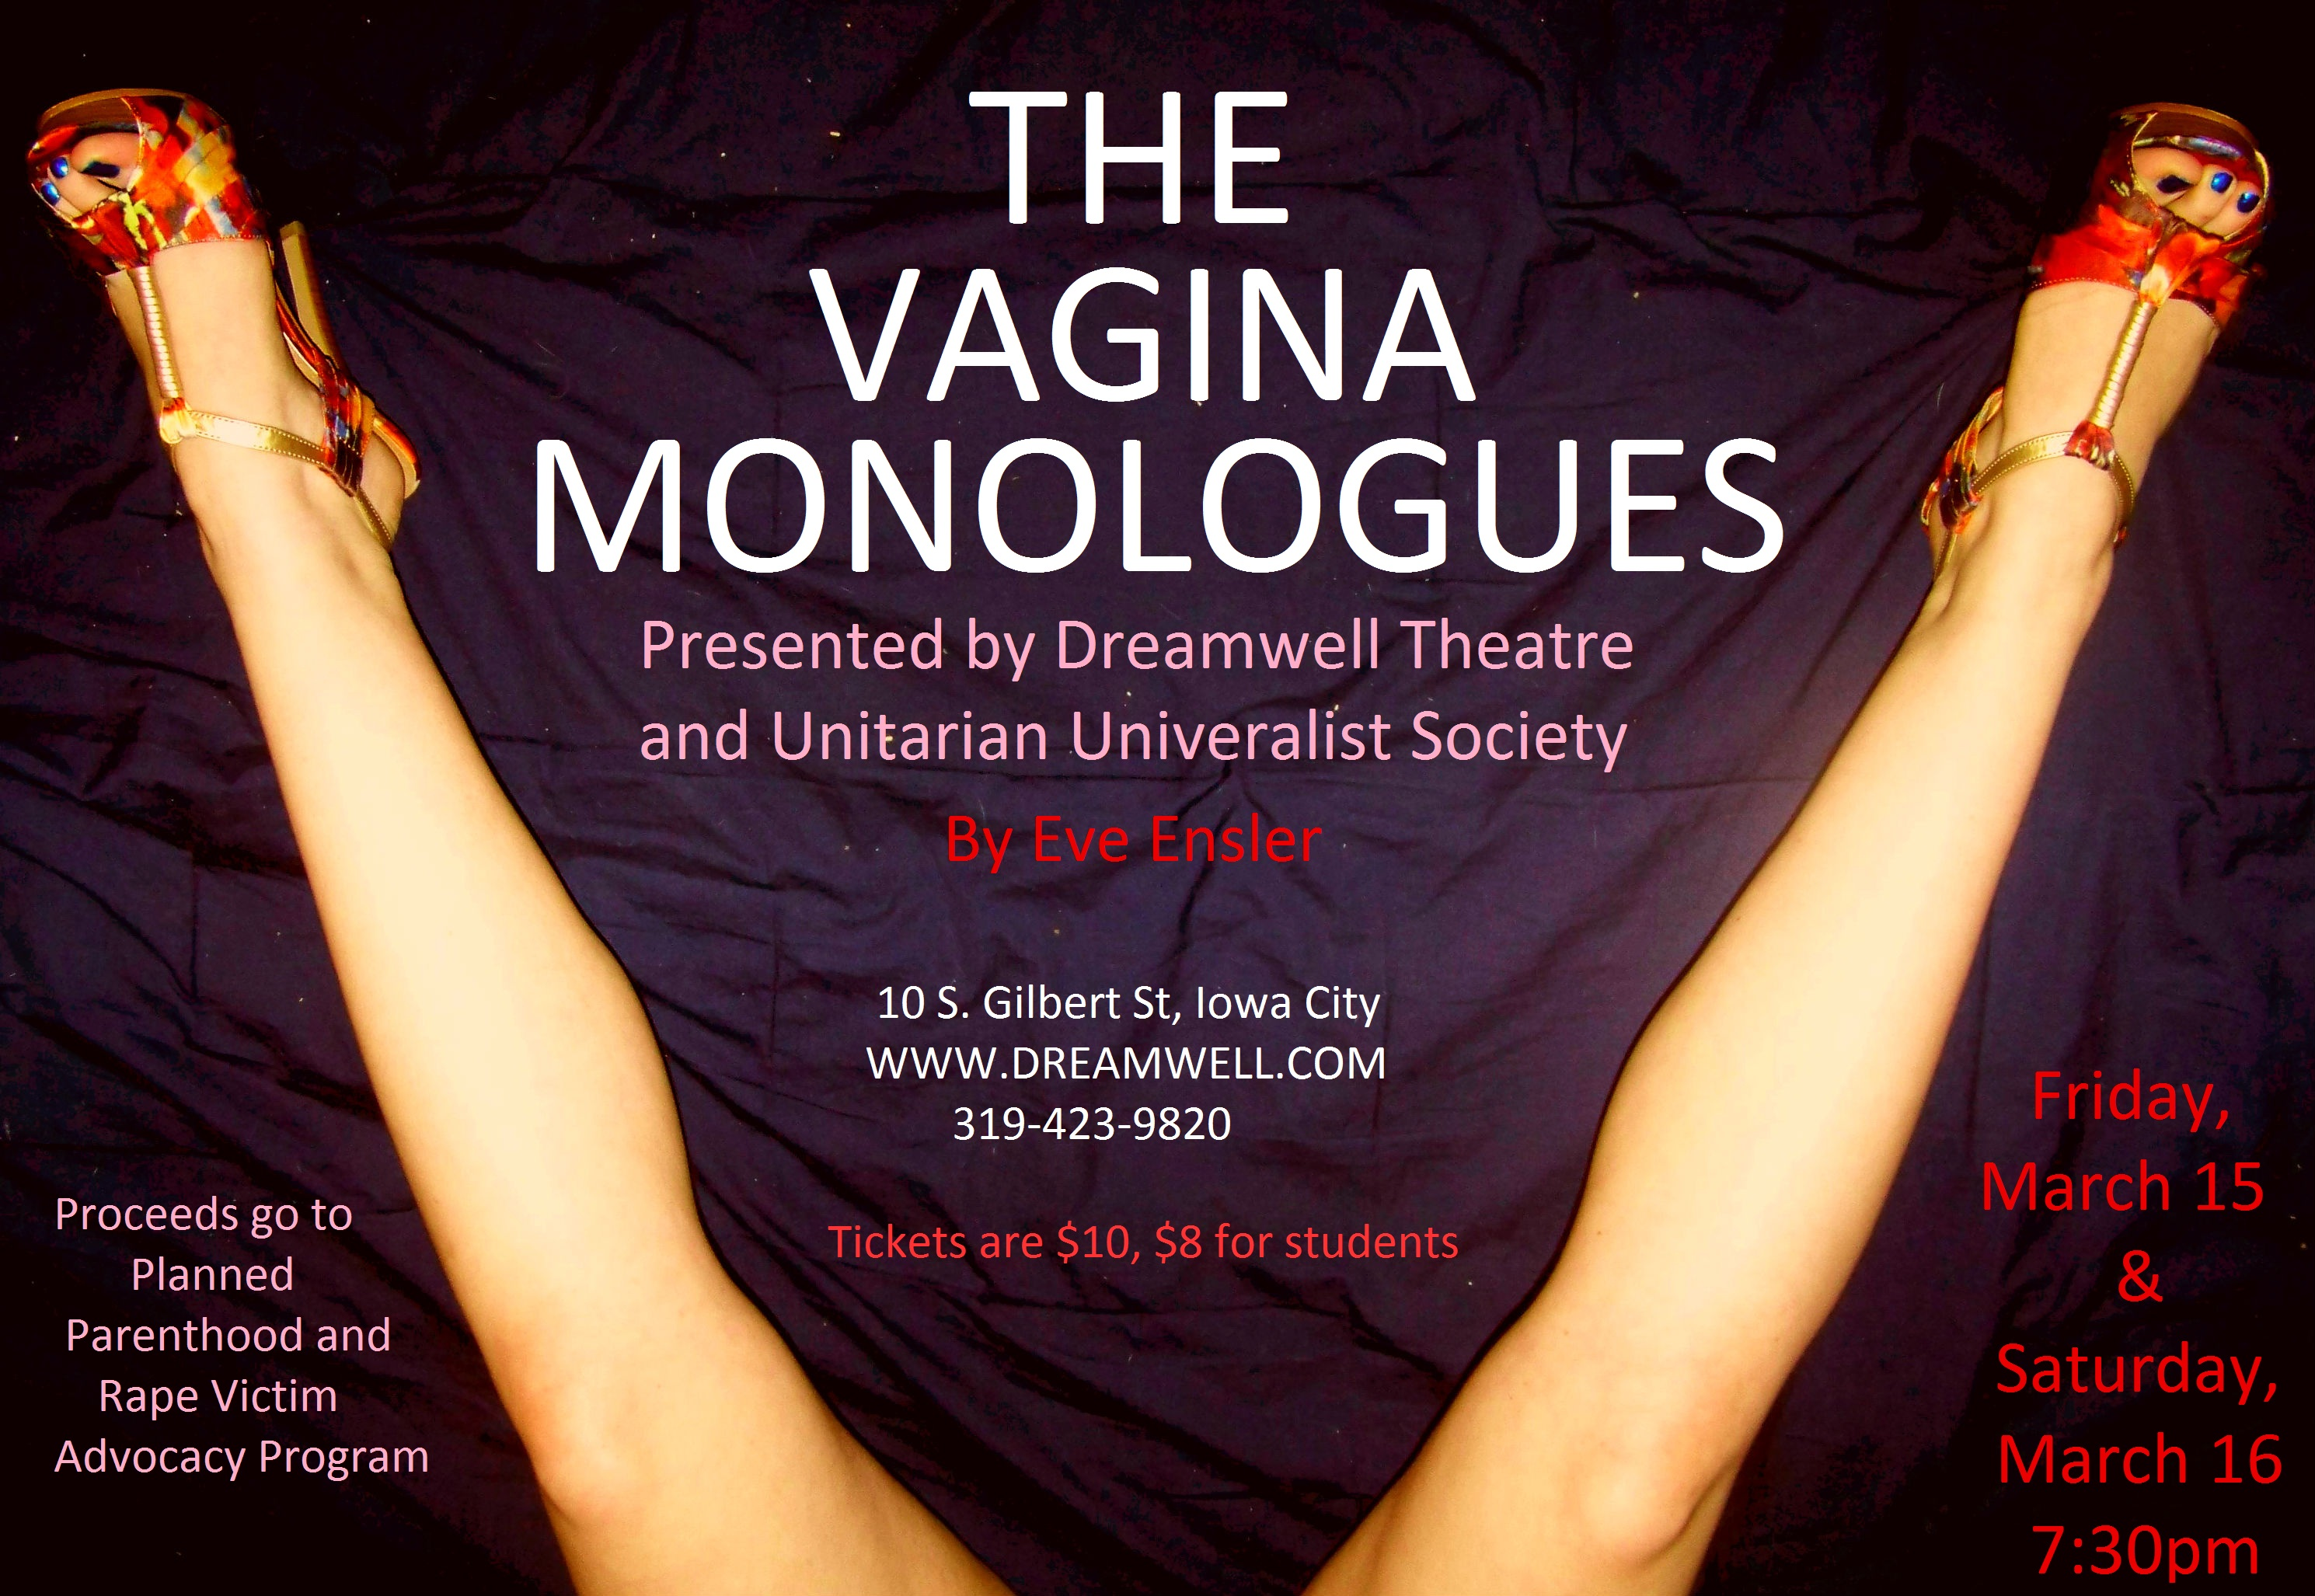 The Vagina Monologues - VDAY   Hebdenbridge.org